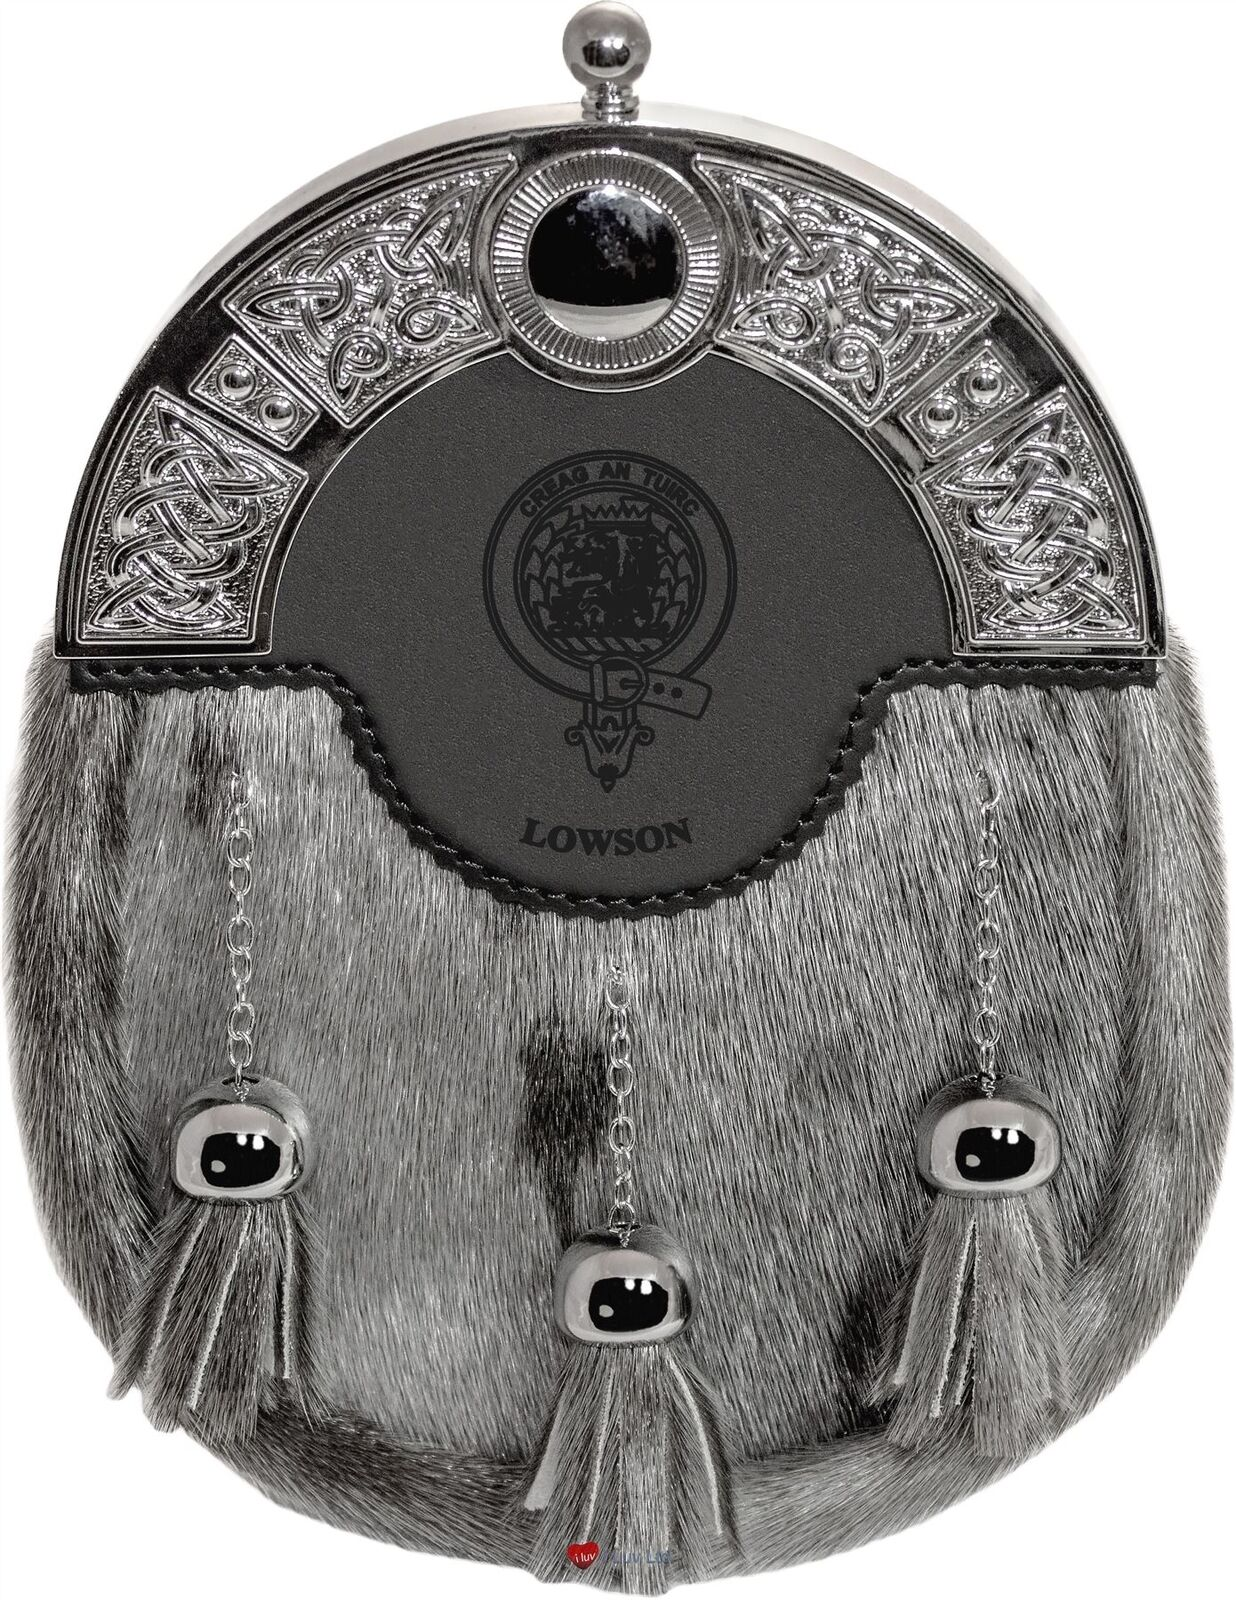 Lowson Dress Sporran 3 Tassels Studded Celtic Arch Scottish Clan Crest